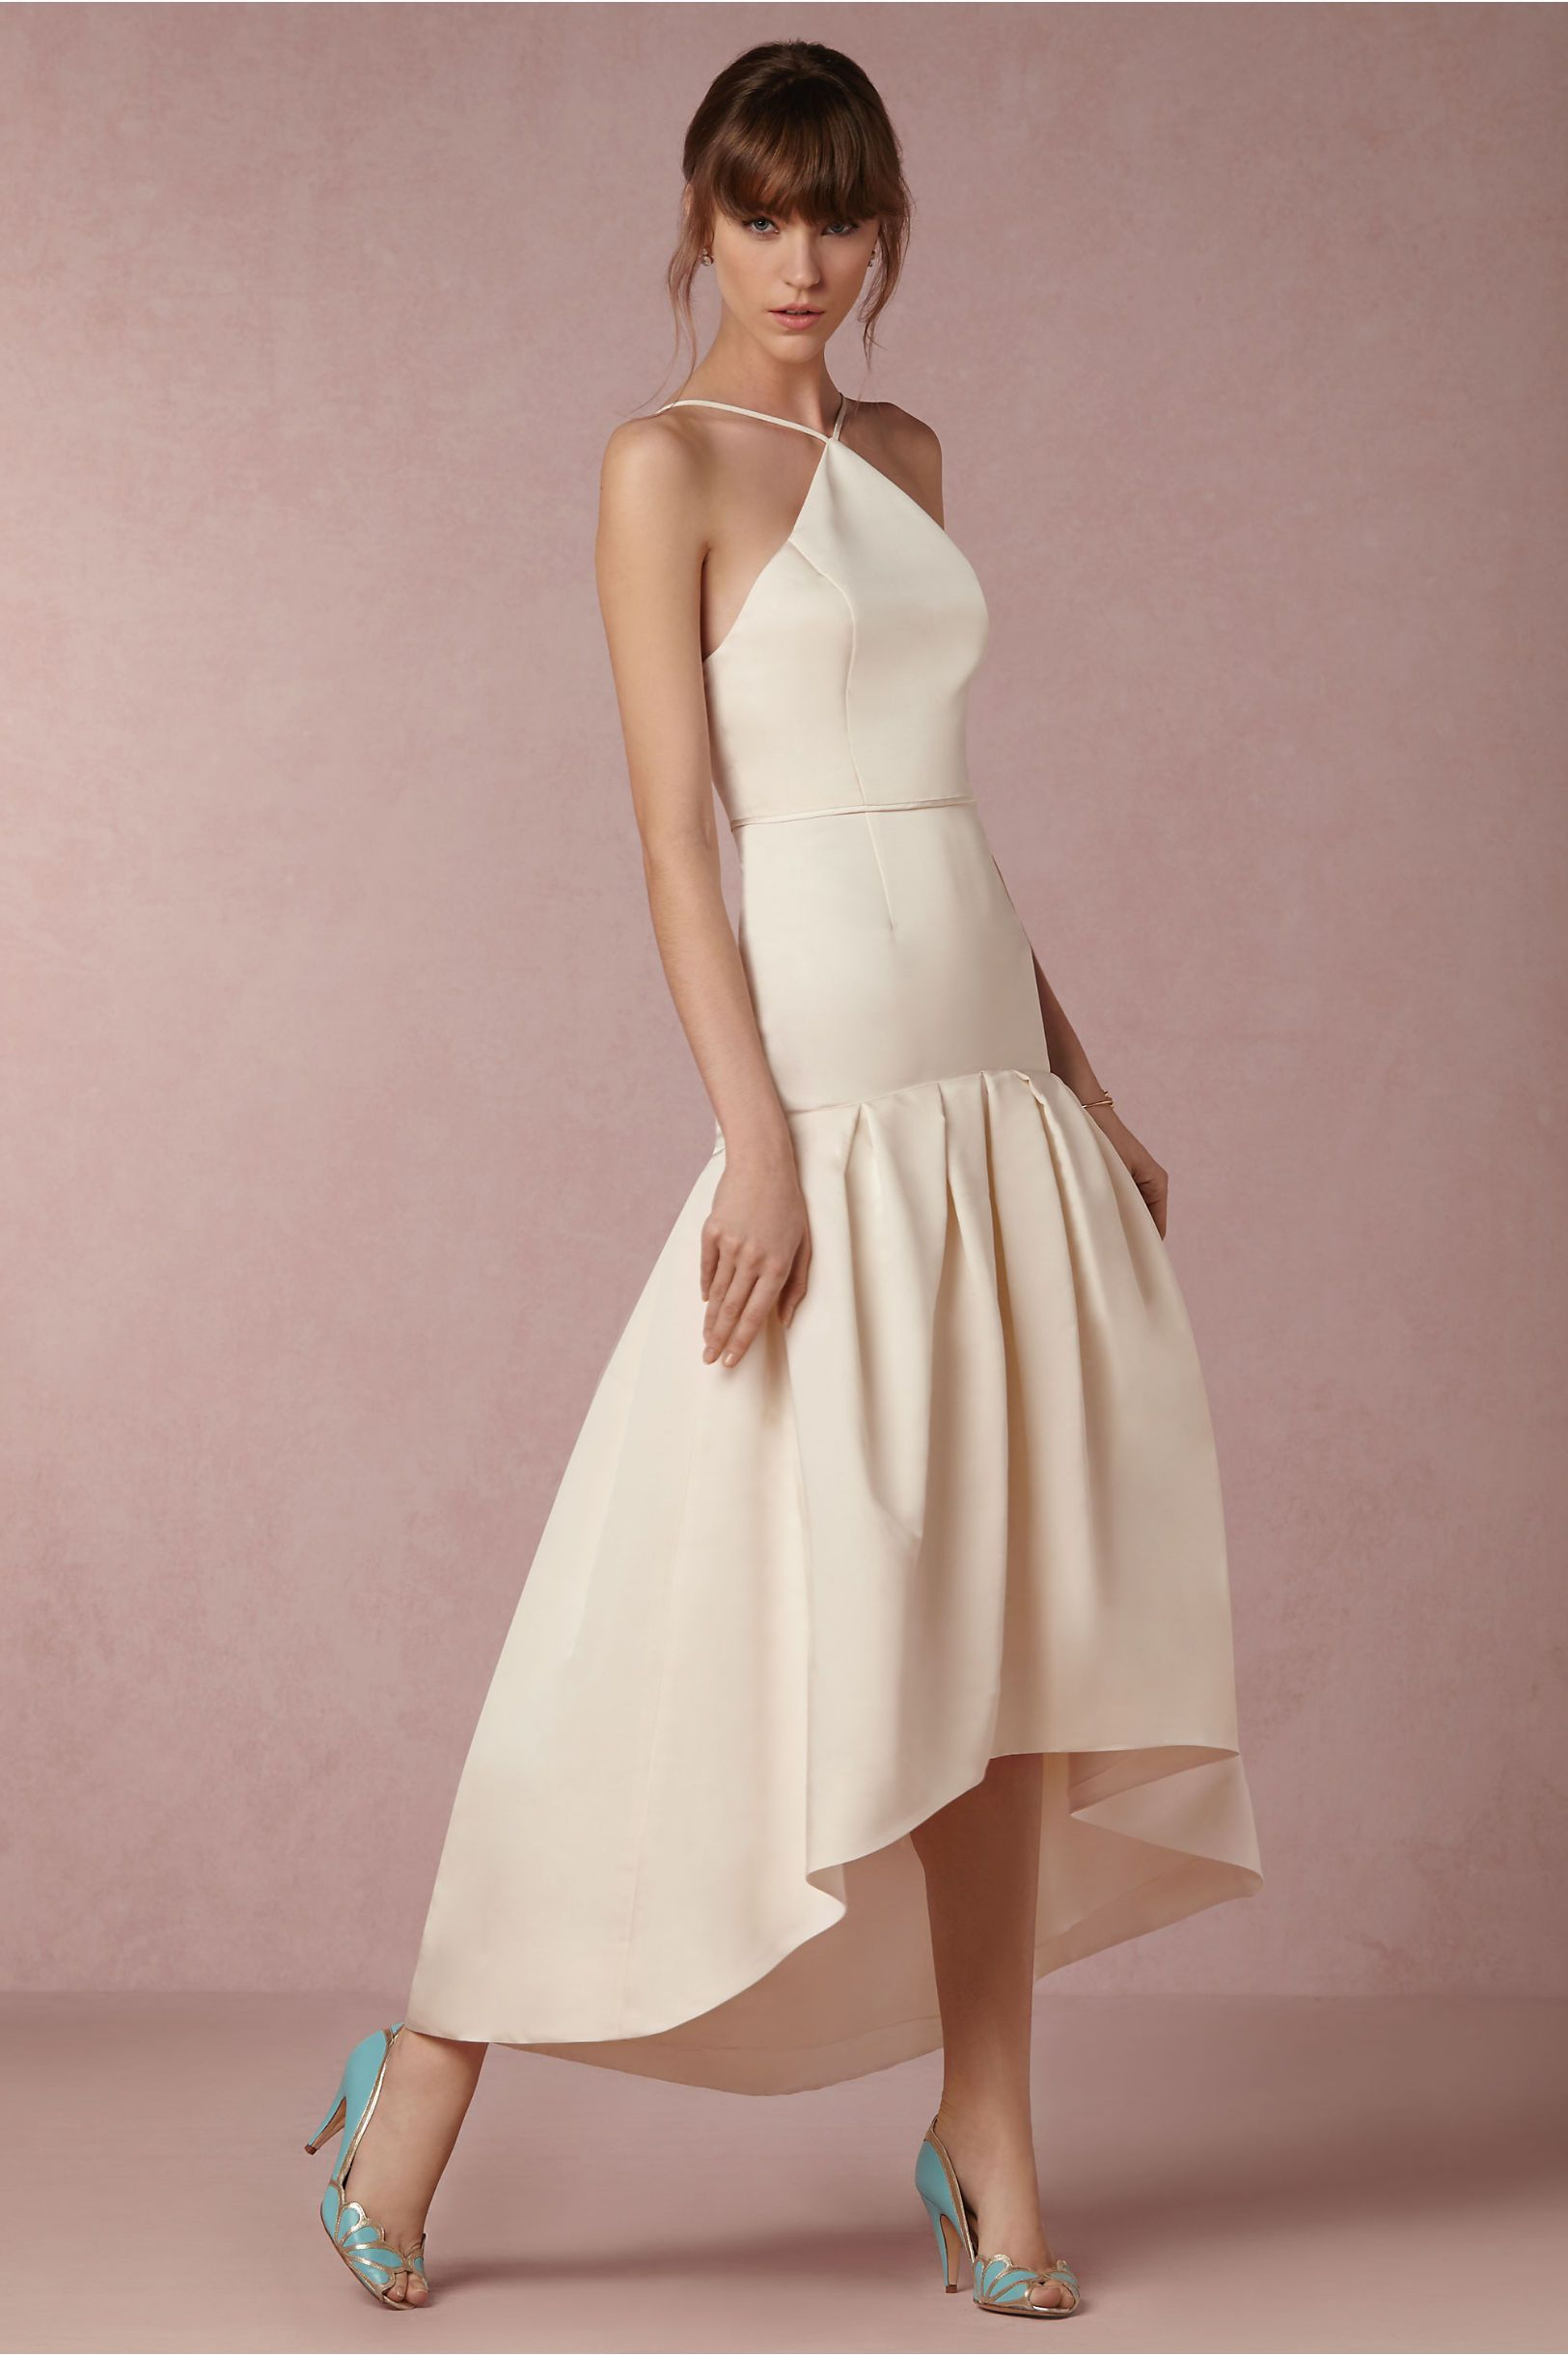 Long wedding reception dresses for the bride  BHLDN Vega Dress in Dresses View All Dresses at BHLDN  Dress